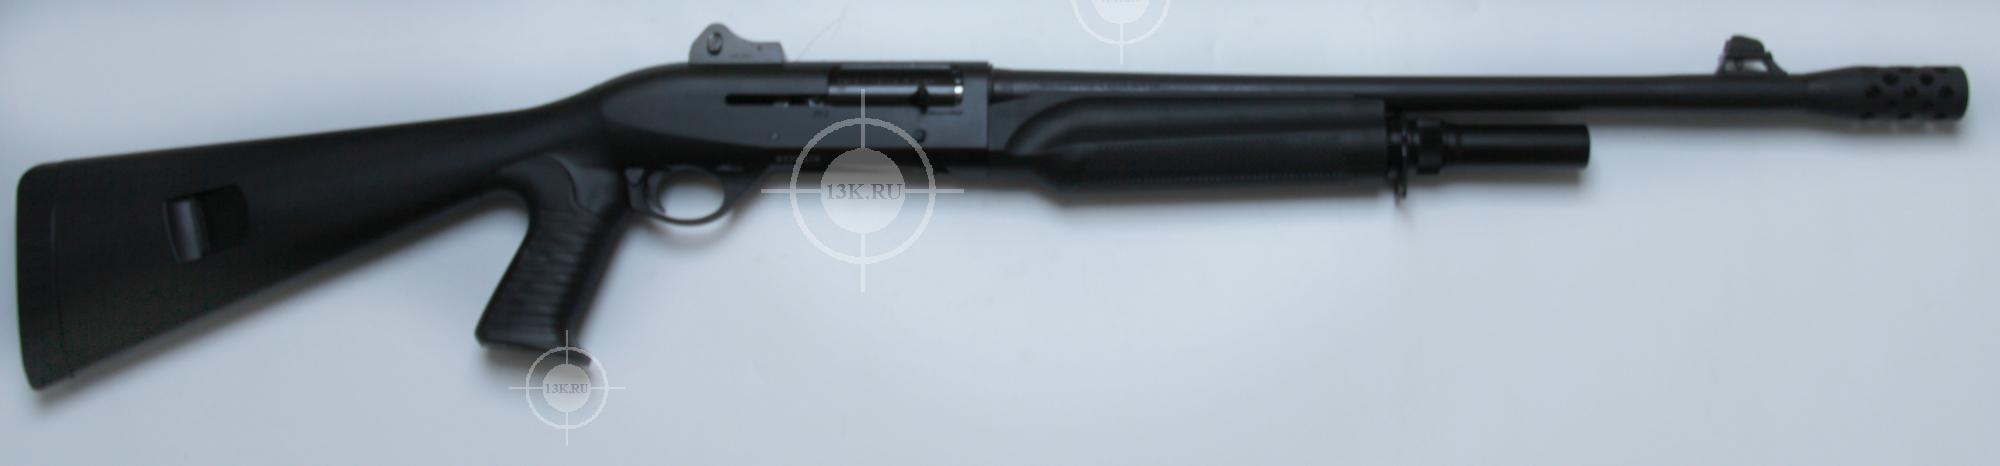 Benelli m2 tactical reviews - Filename 4708_0 Jpg